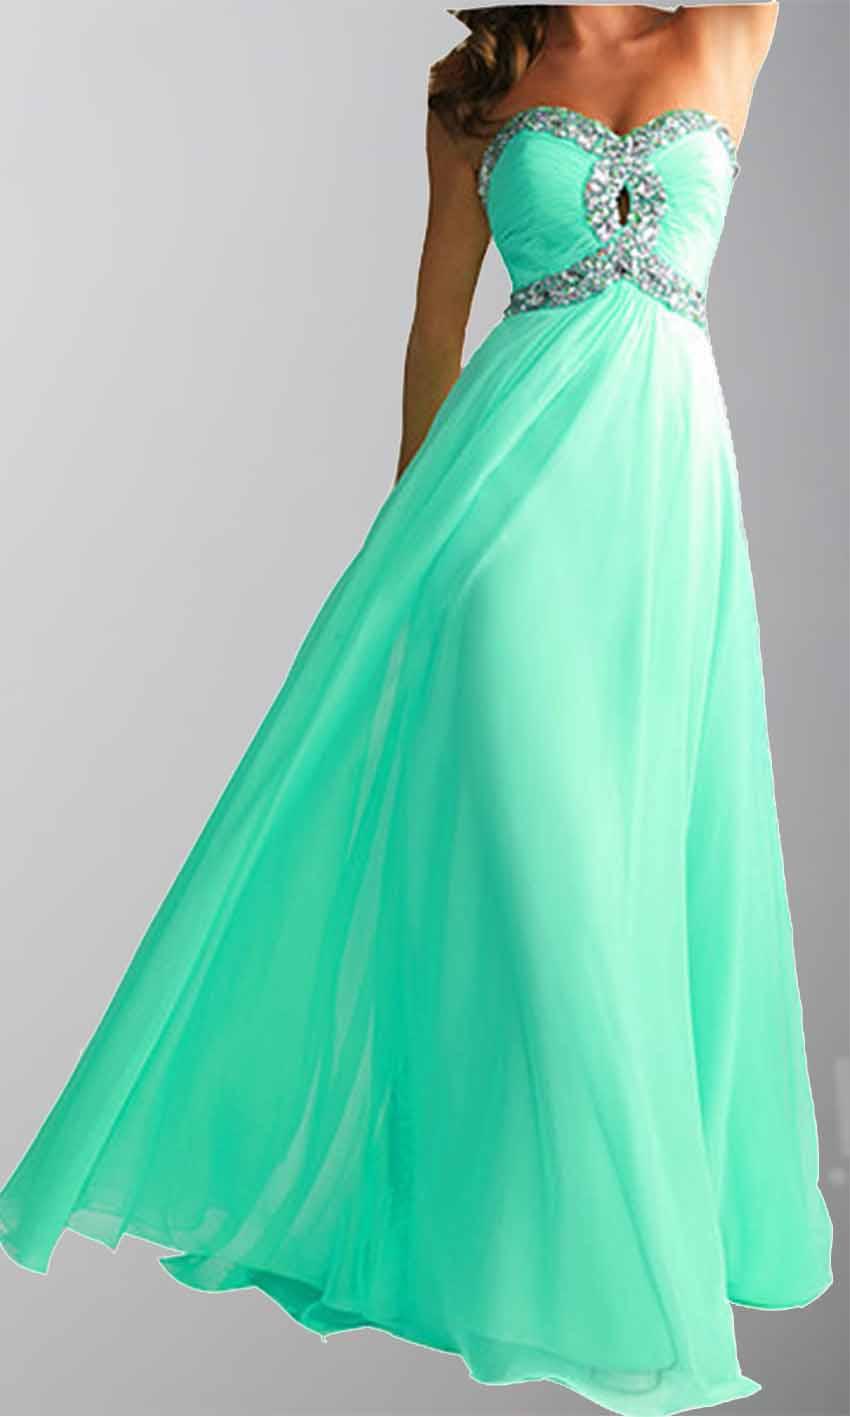 Keyhole Bust Mint Full Length Sequin Prom Dresses KSP307 [KSP307 ...